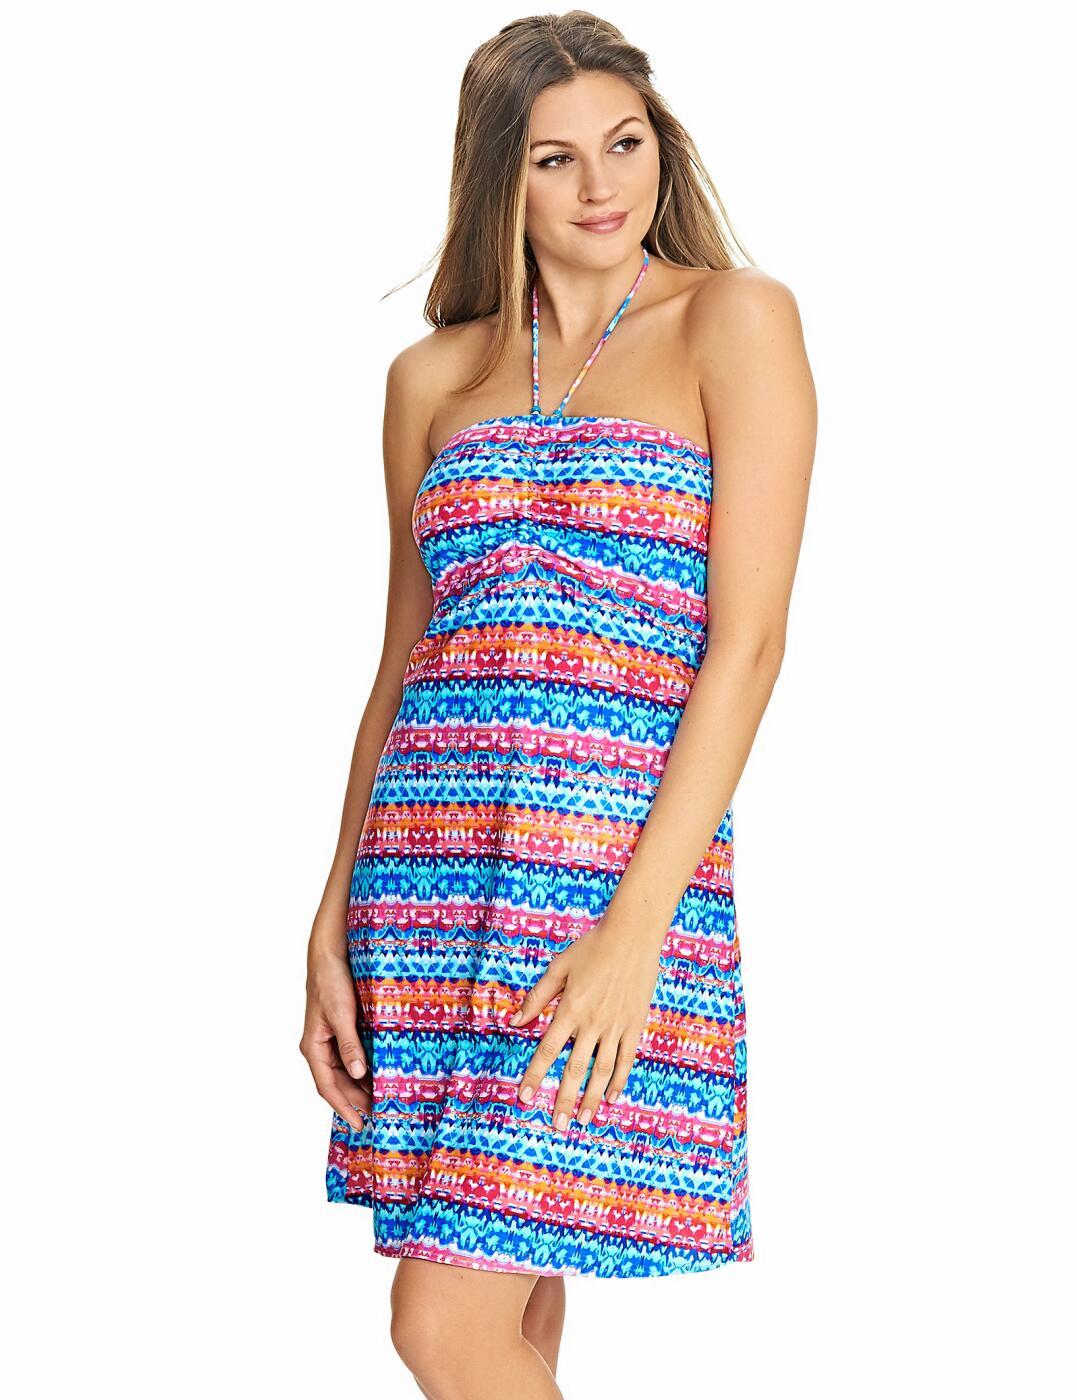 4040 Freya Cuban Crush Beach Dress Tunic Muti - 4040 Multi